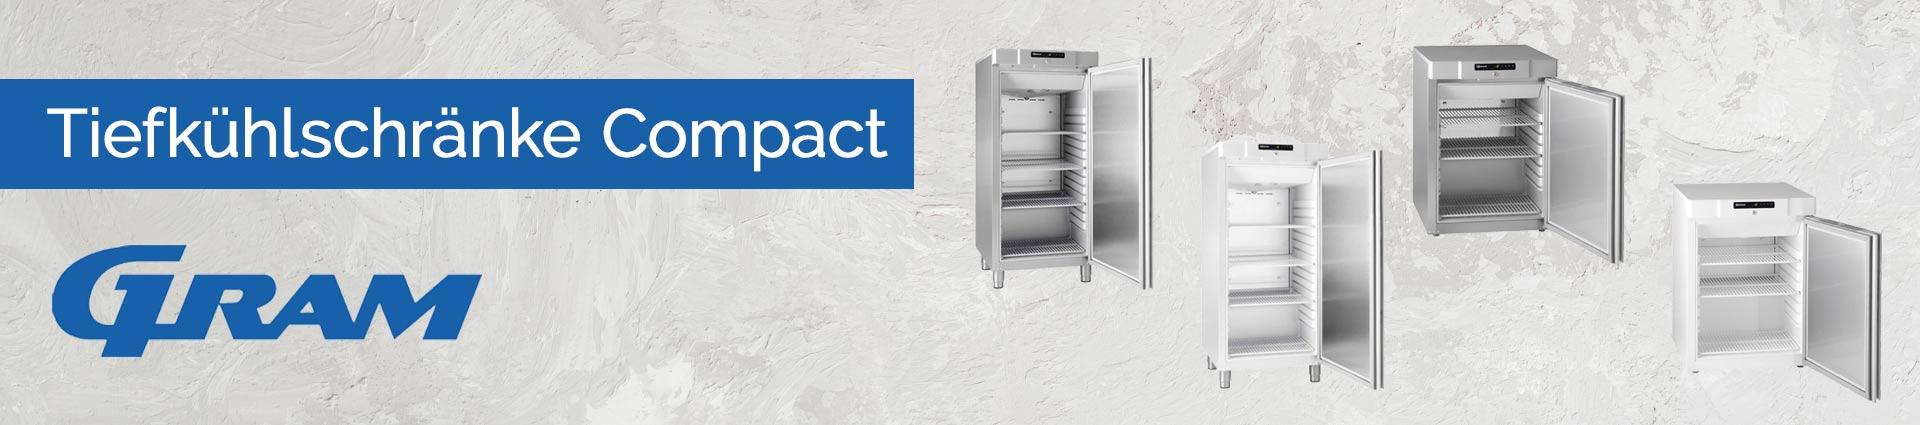 GRAM Tiefkühlschränke Compact Banner